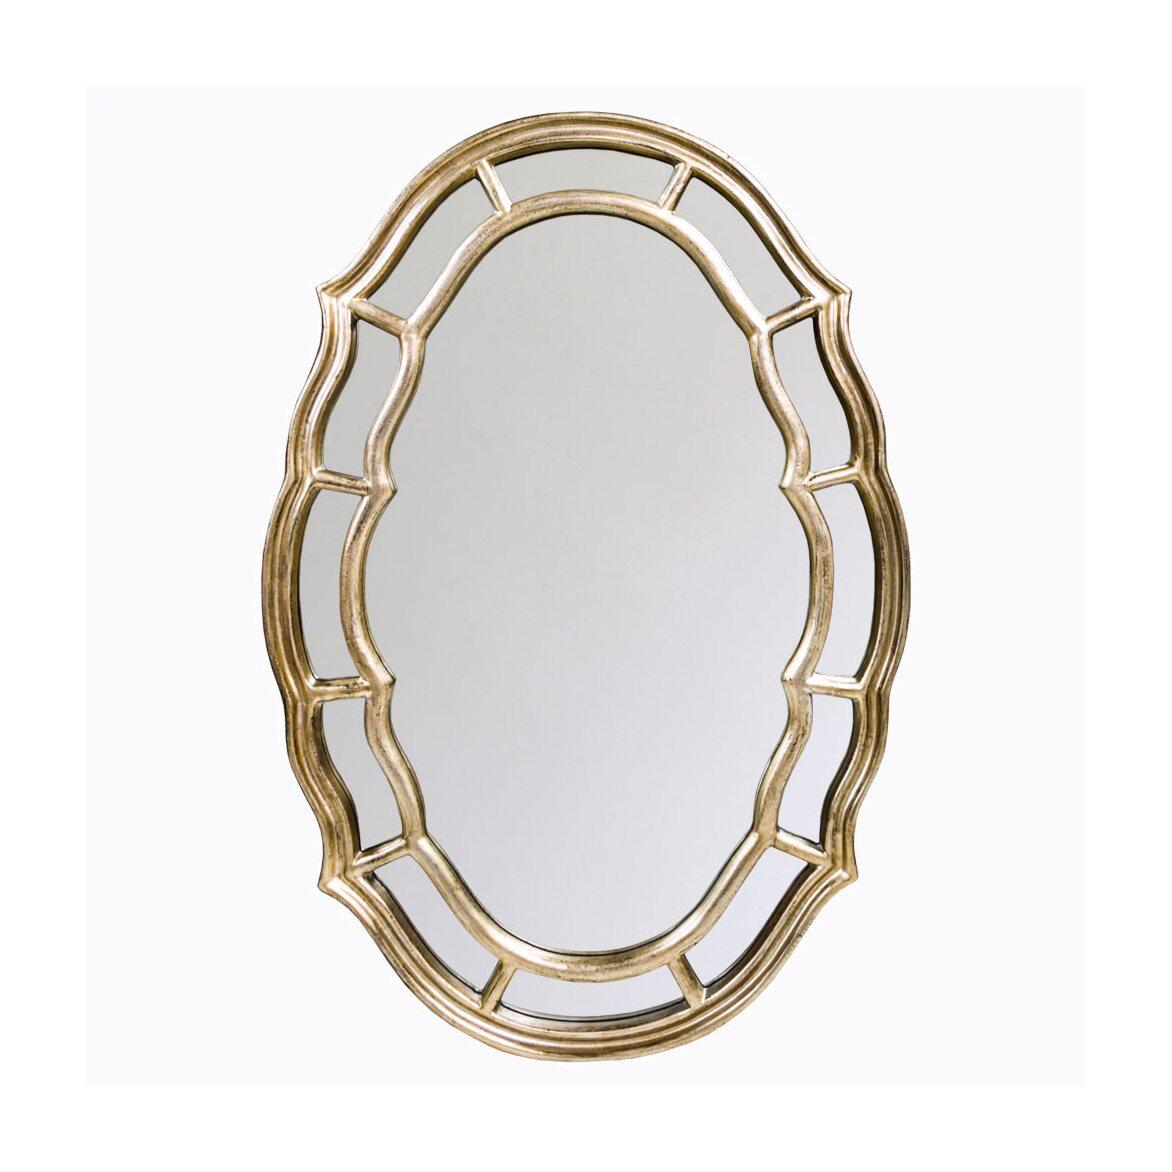 Настенное зеркало «Марлен» | Настенные зеркала Kingsby